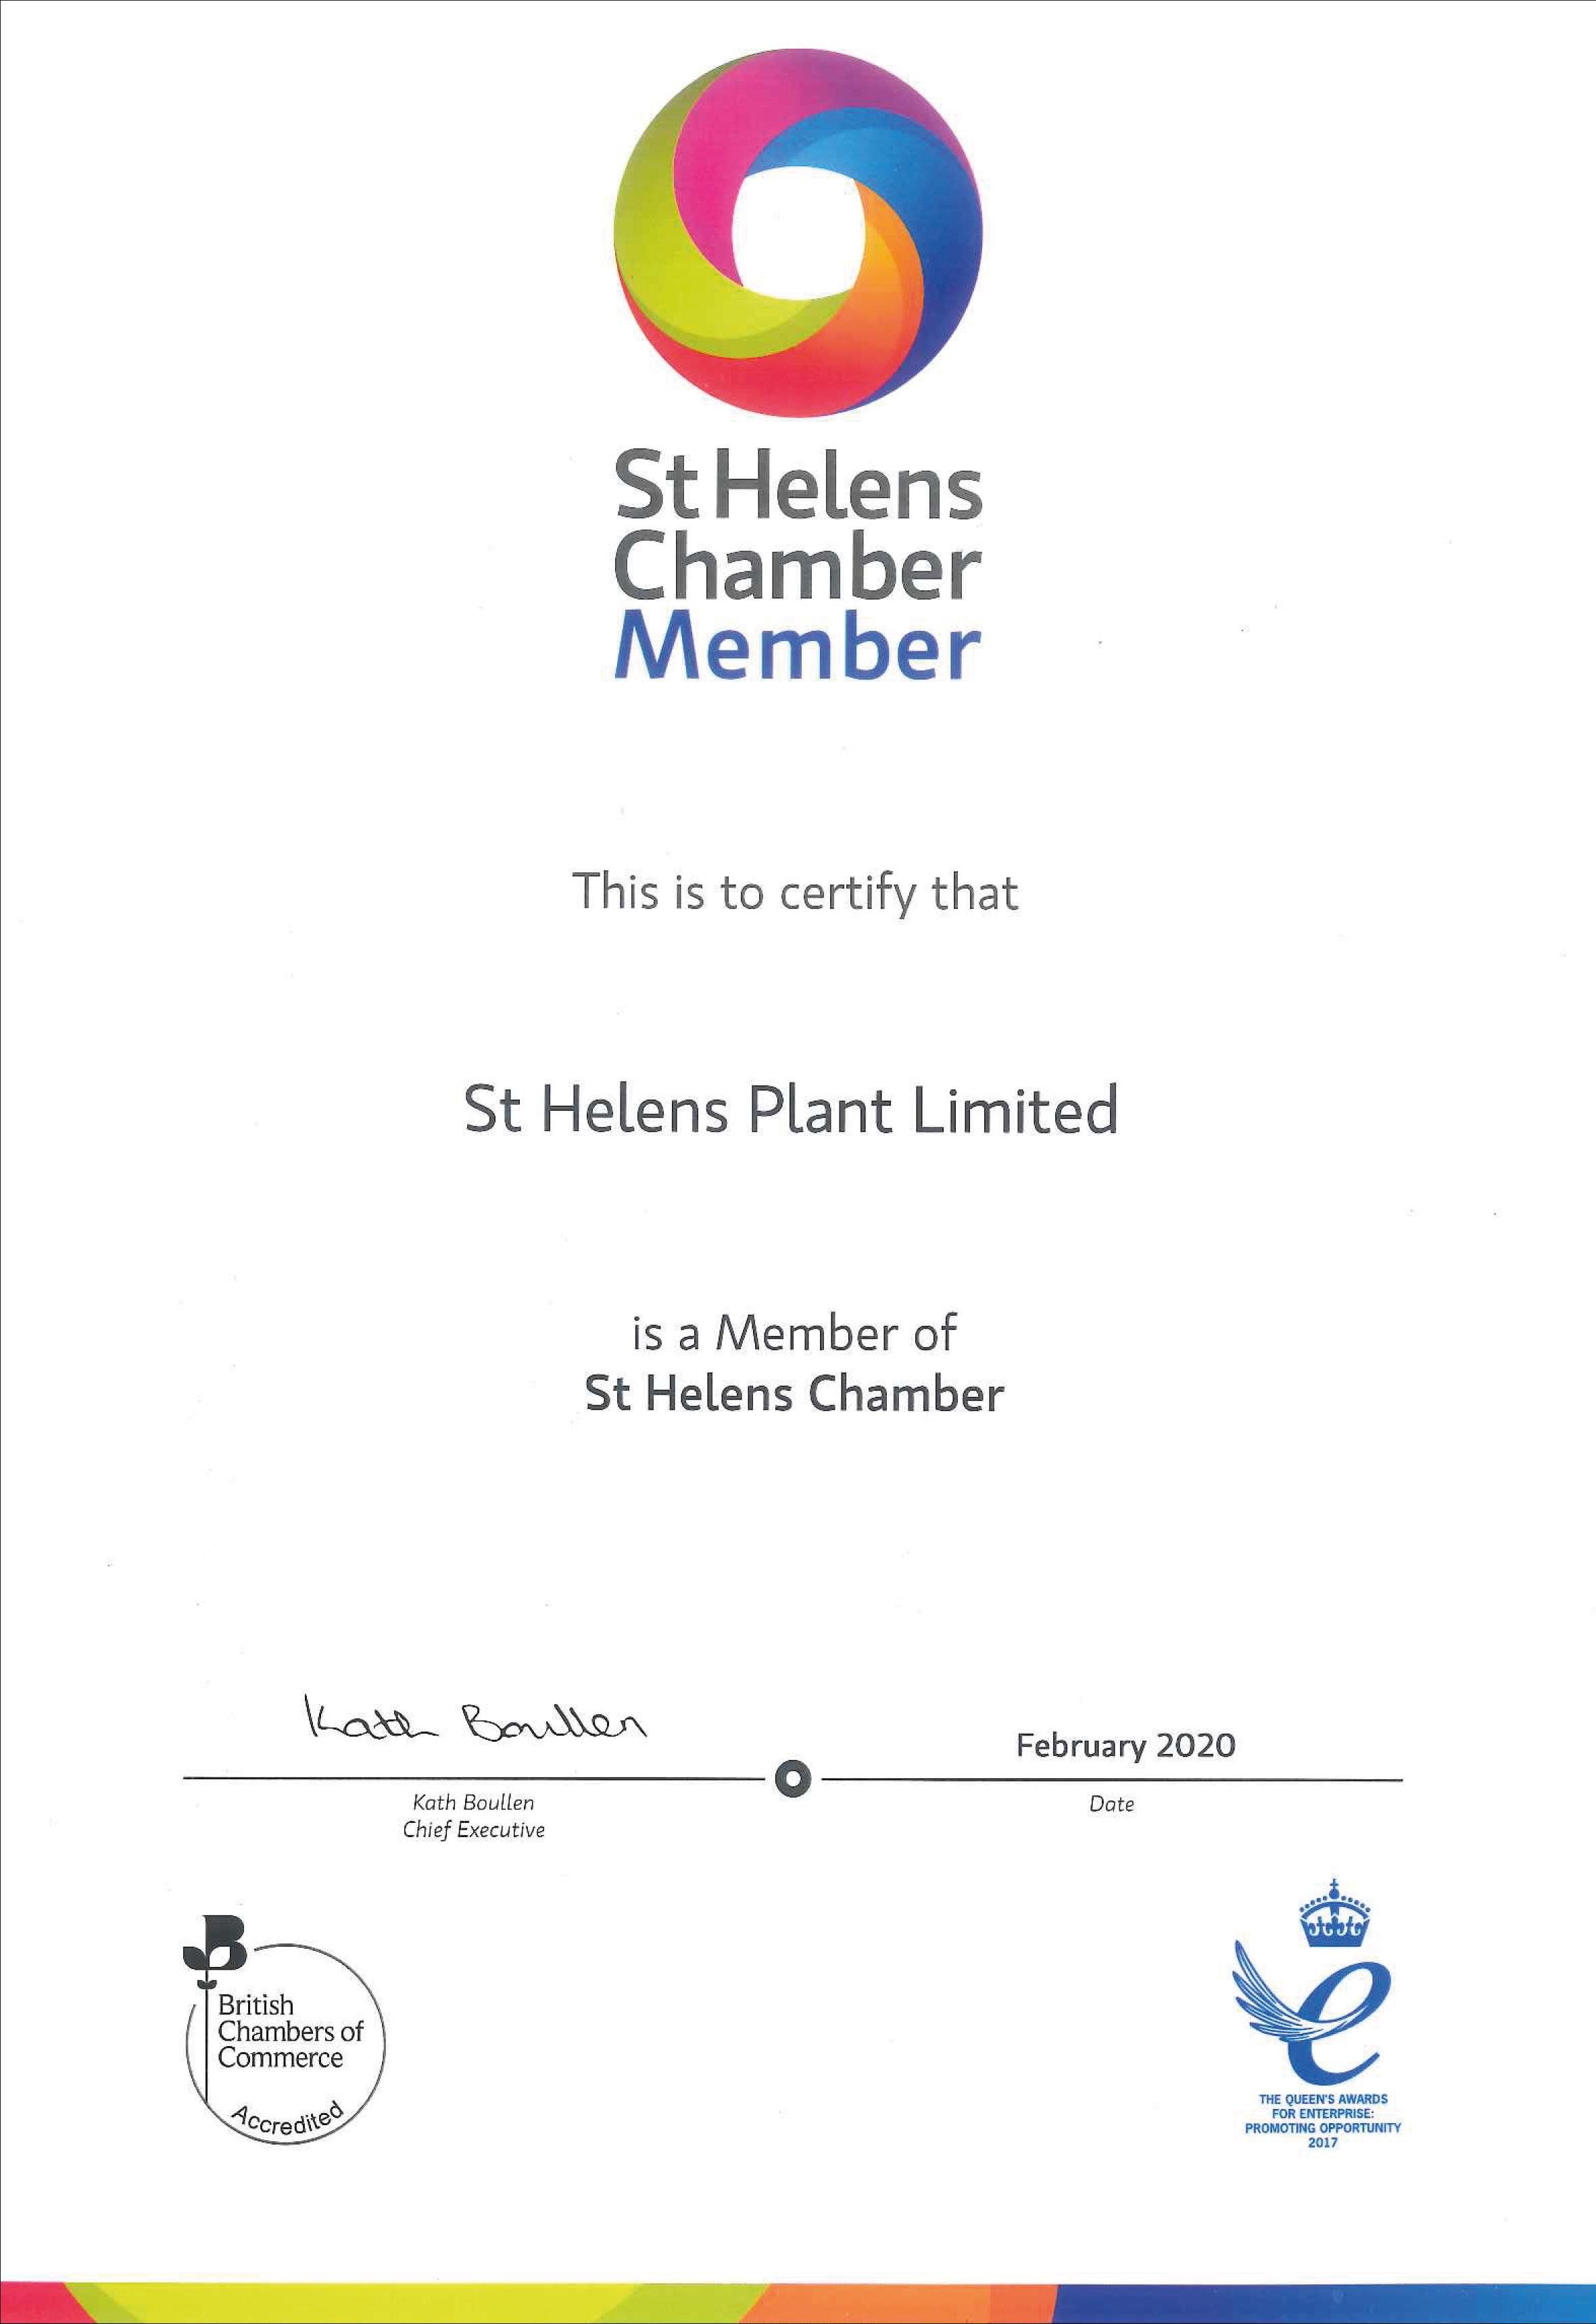 St Helens Chmber Member Certificate -